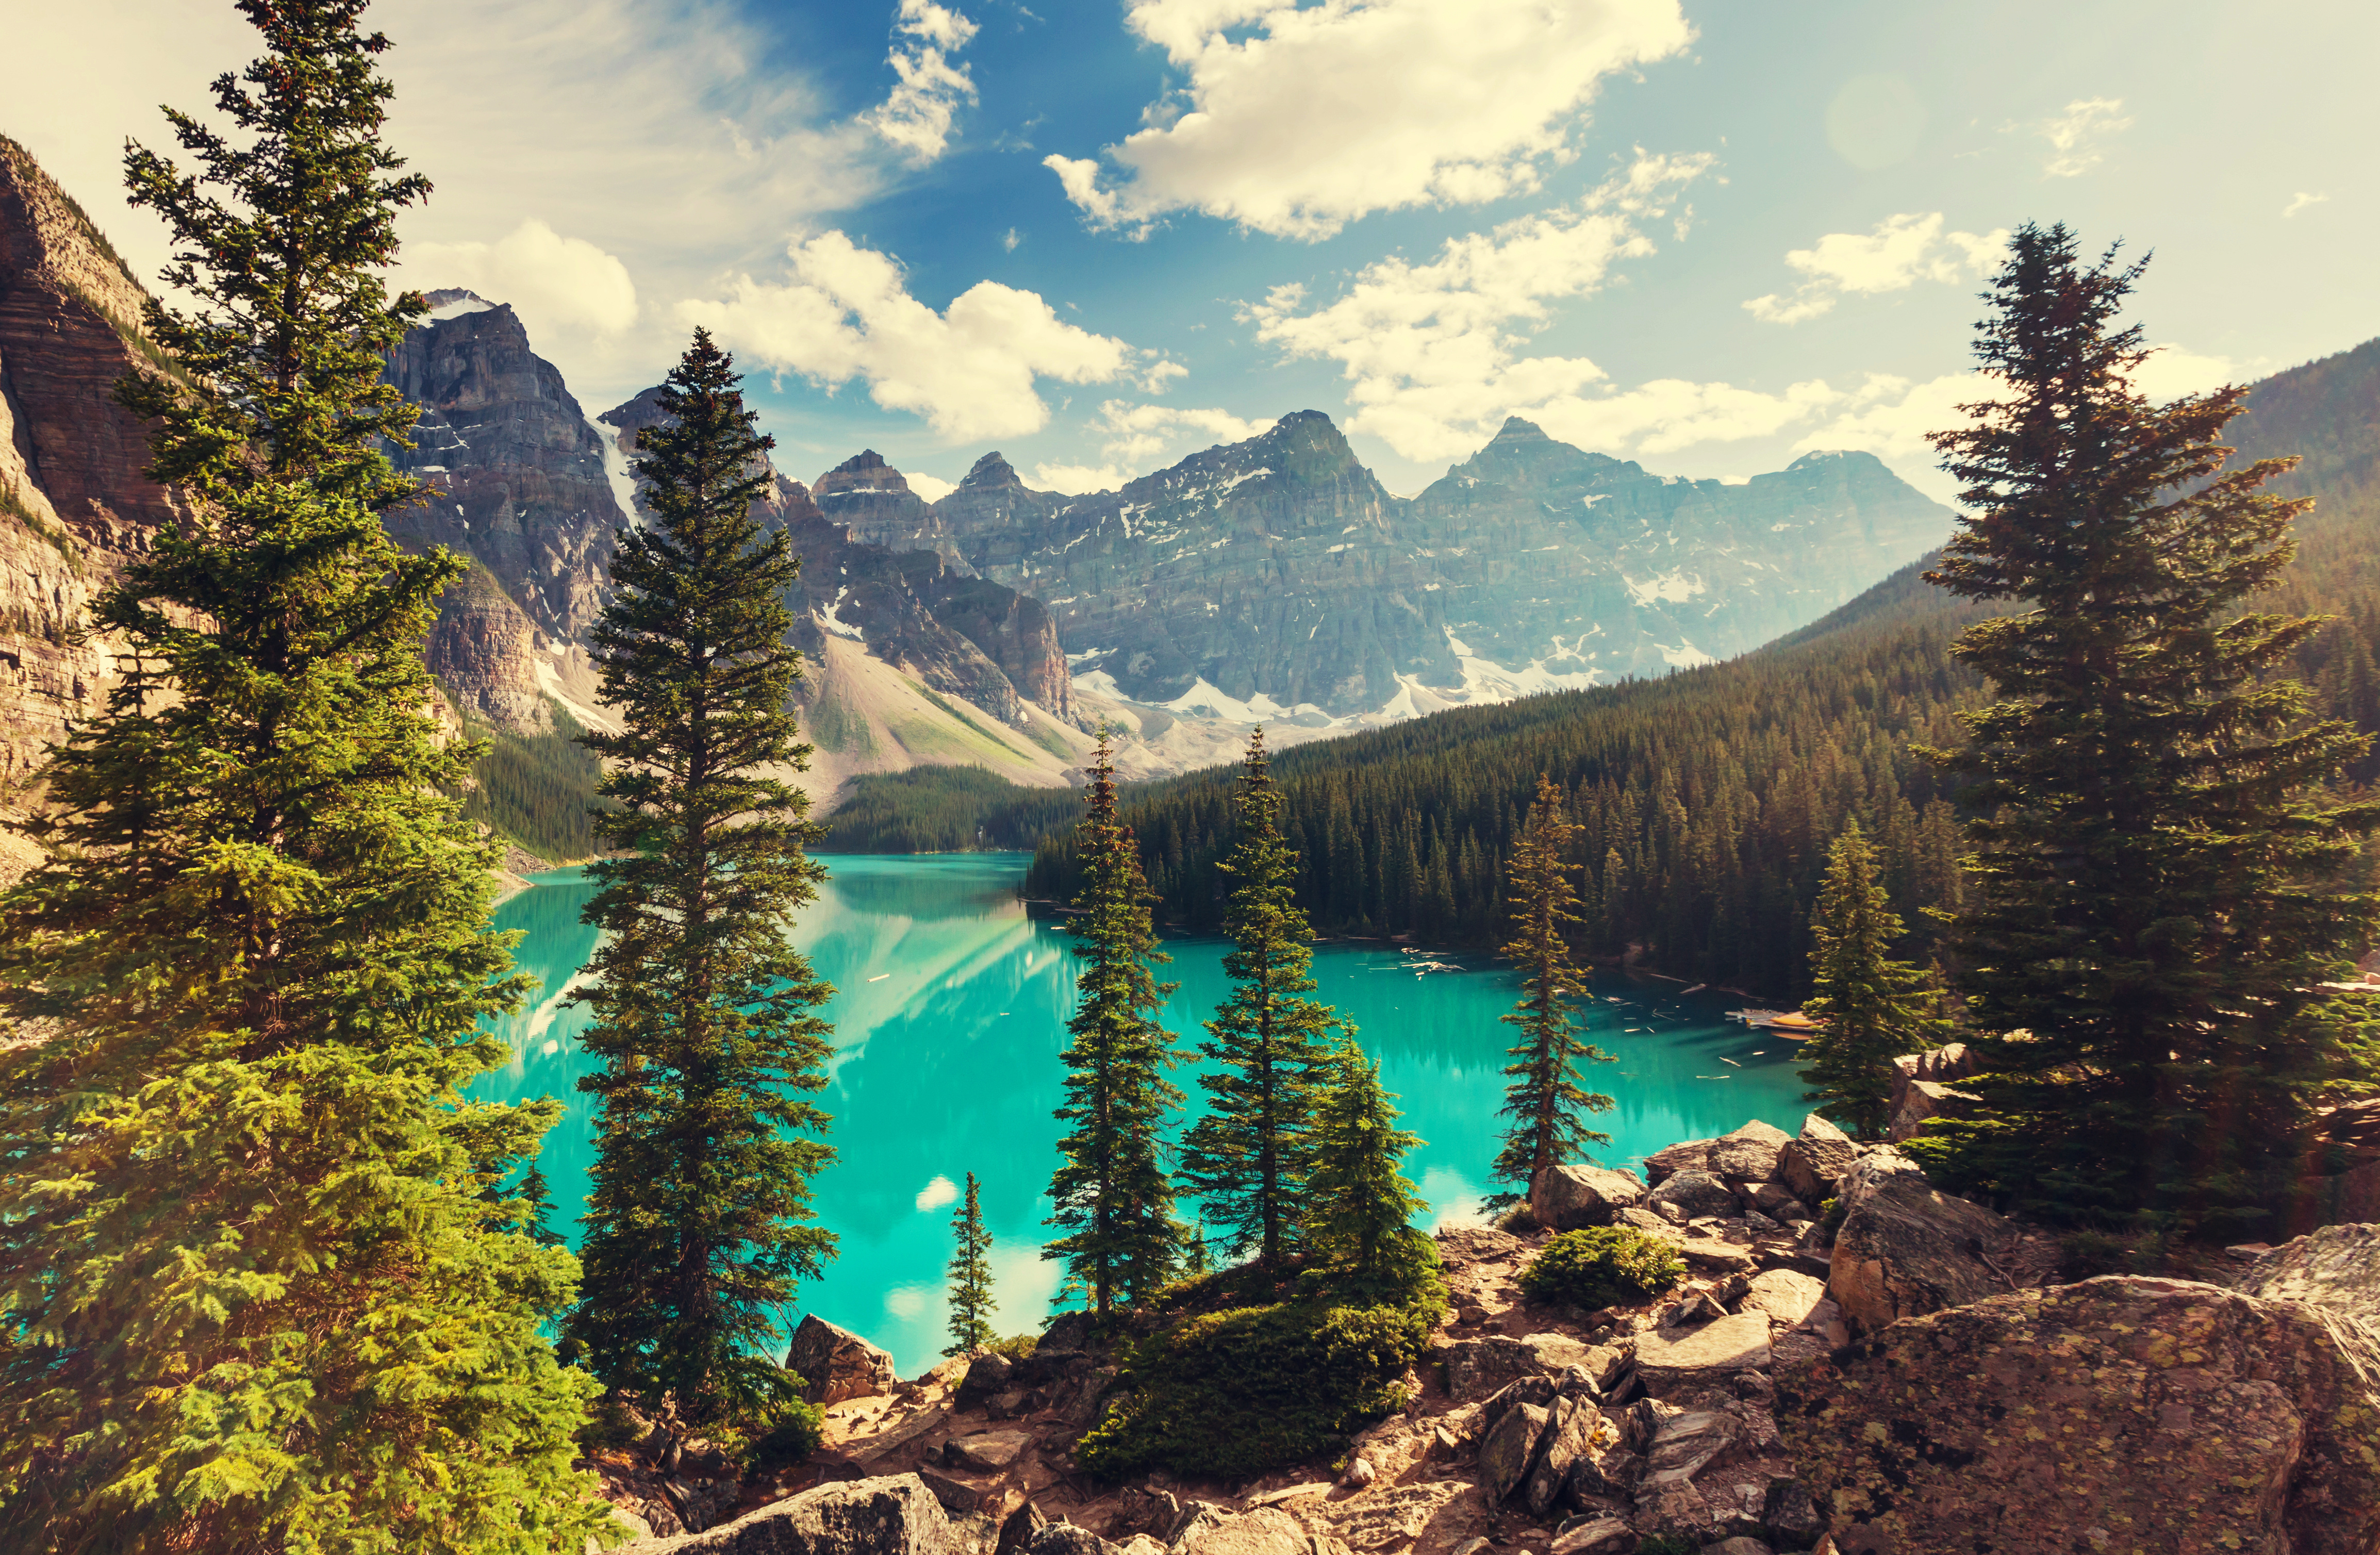 Moraine Lake 4k Ultra HD Wallpaper